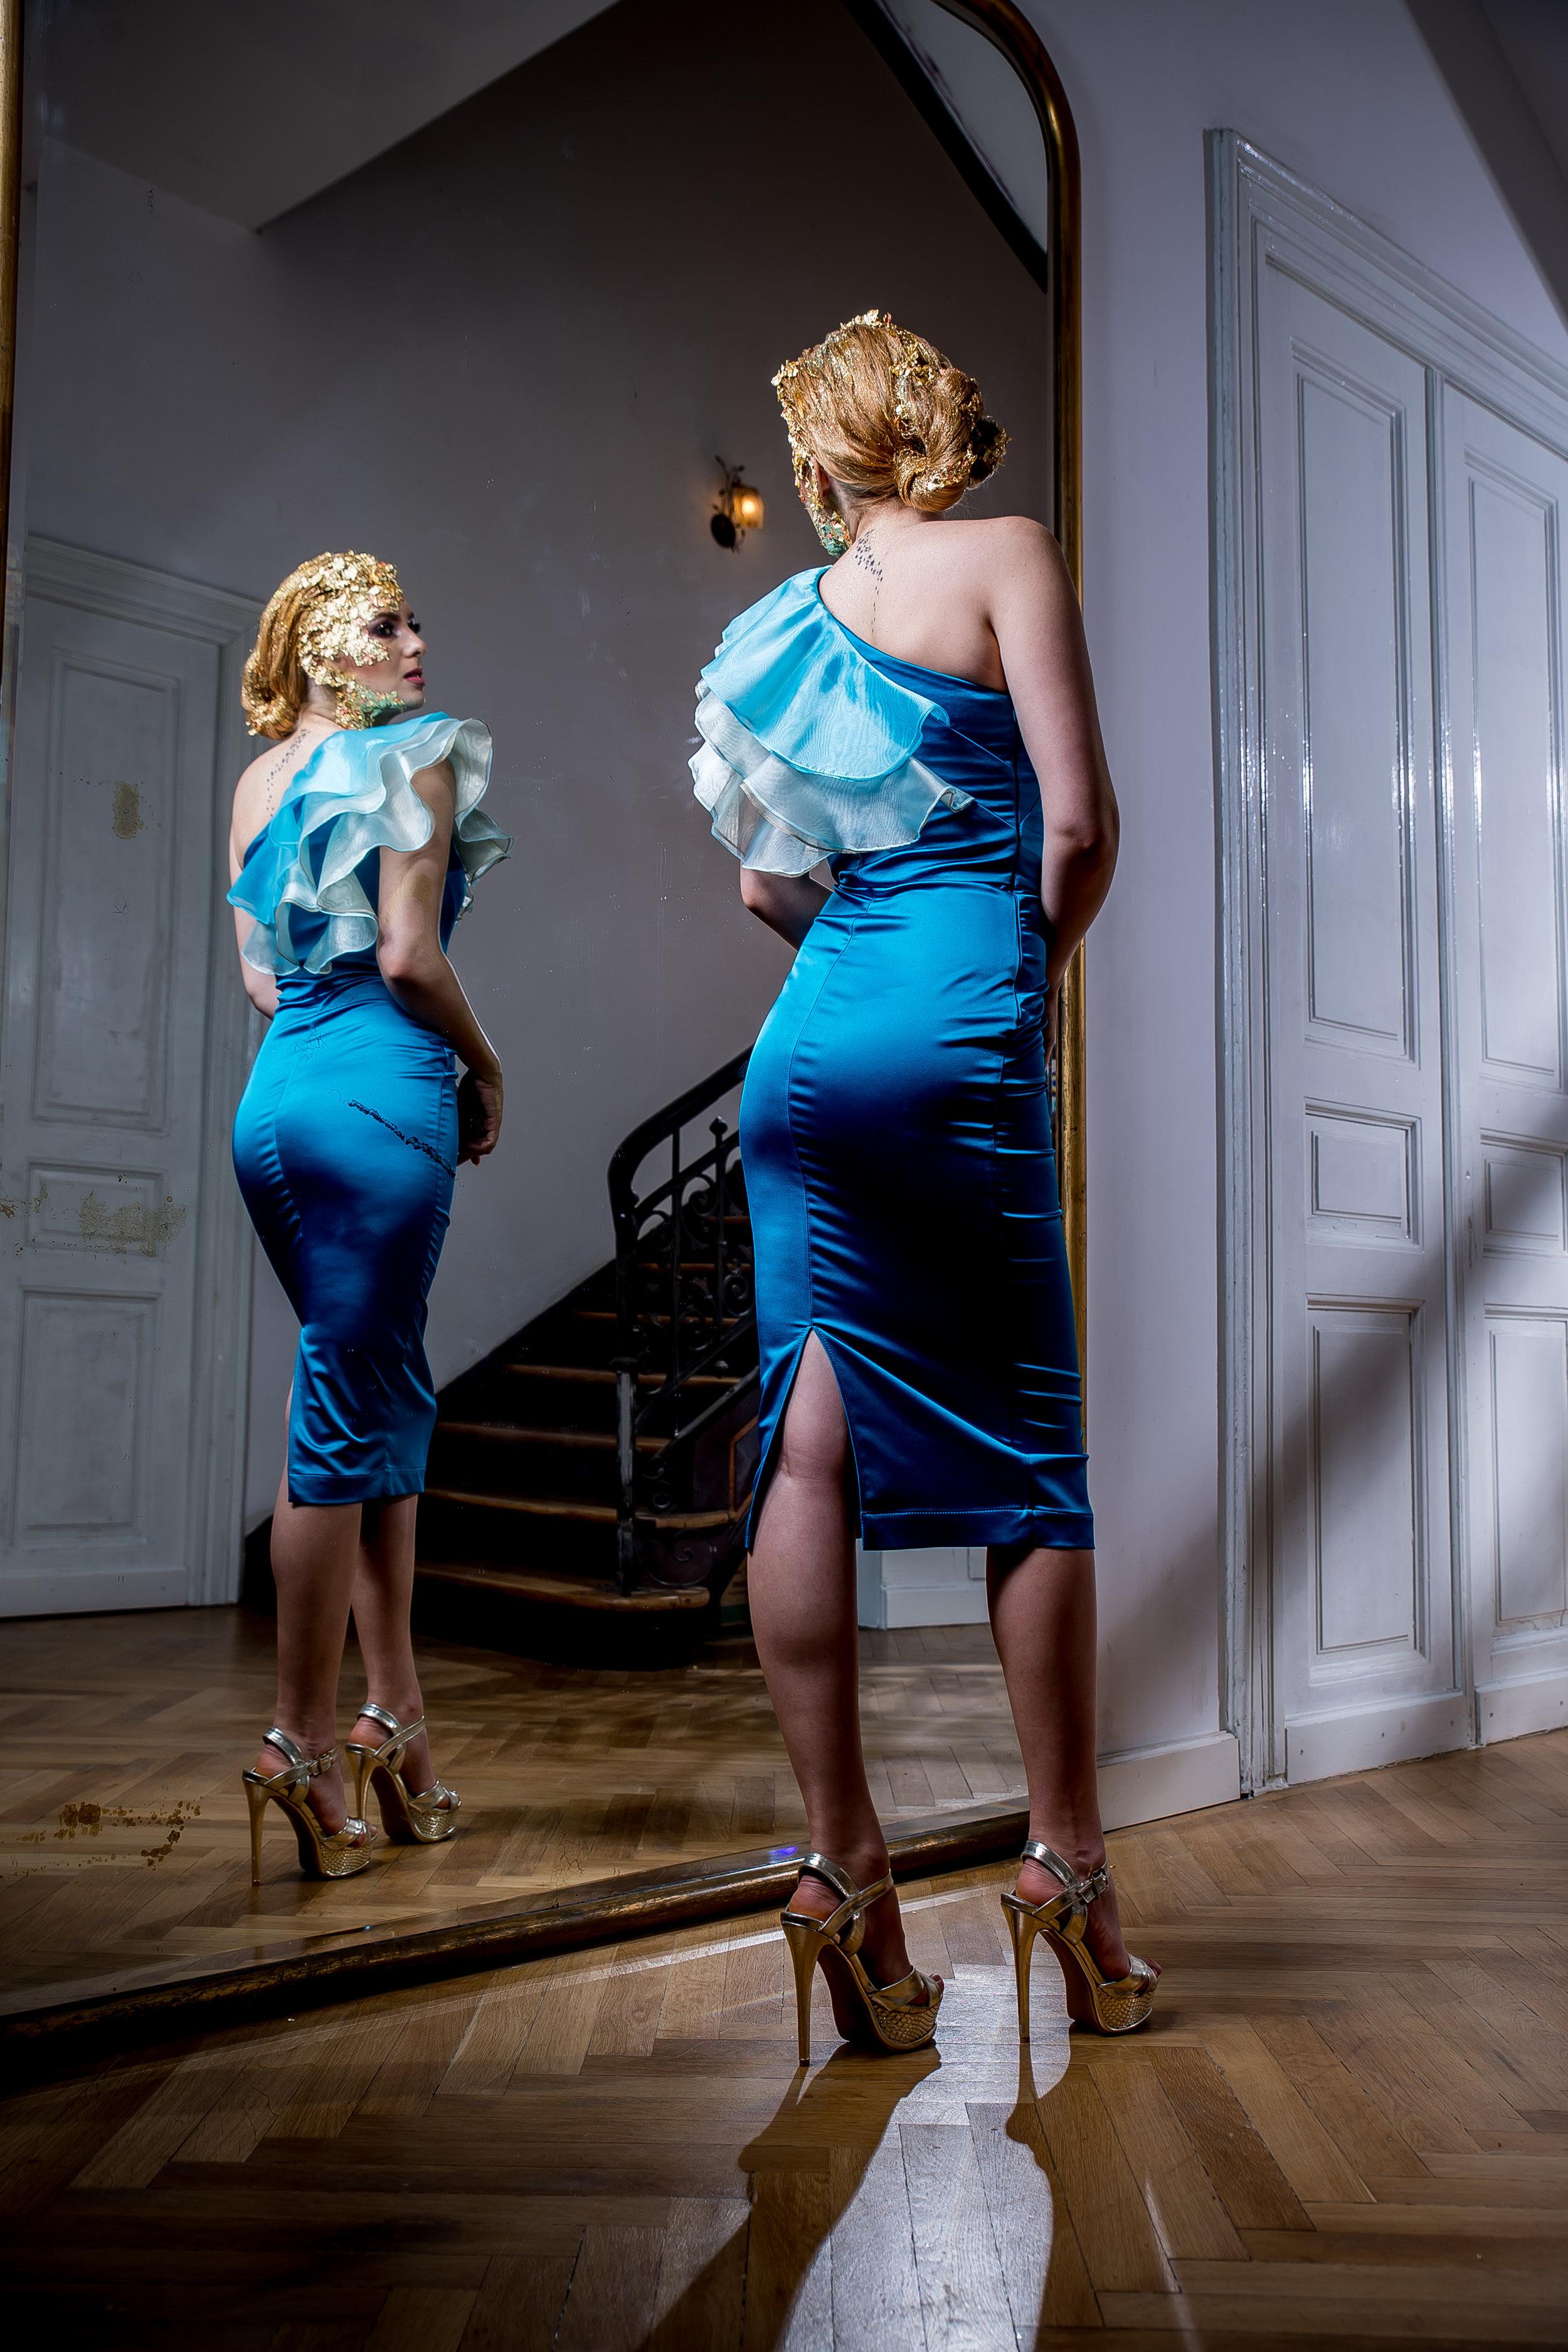 evening dresses Fashion By Laina - Style 23 FARAH TAF016 (3).jpg